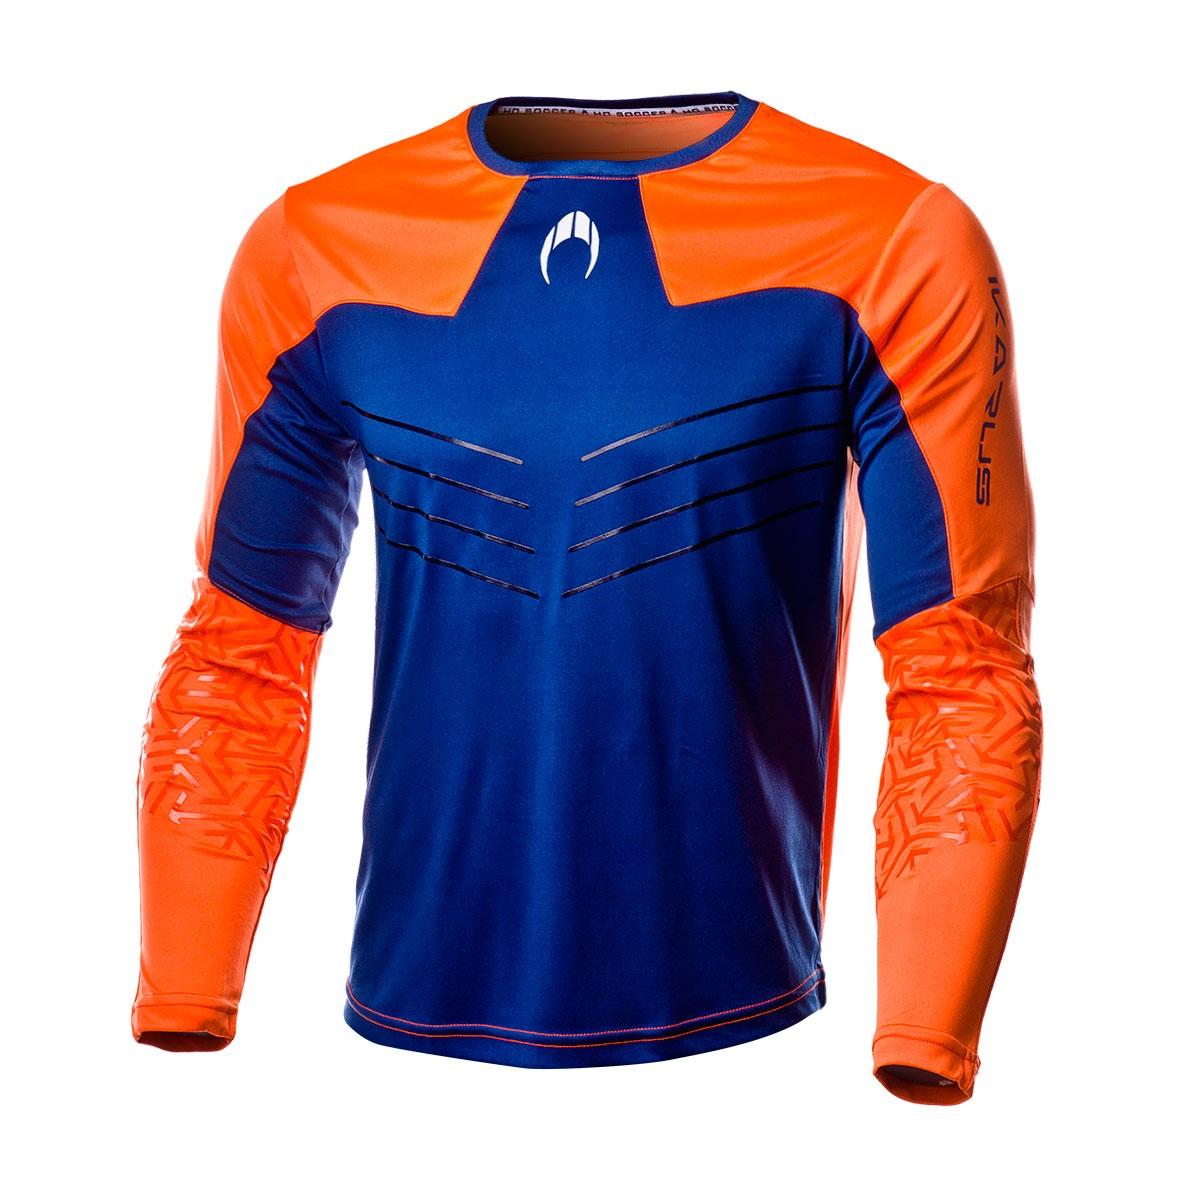 cb11d8fe72d3d Jersey HO Soccer Ikarus 2018 Orange-Blue - Football store Fútbol Emotion